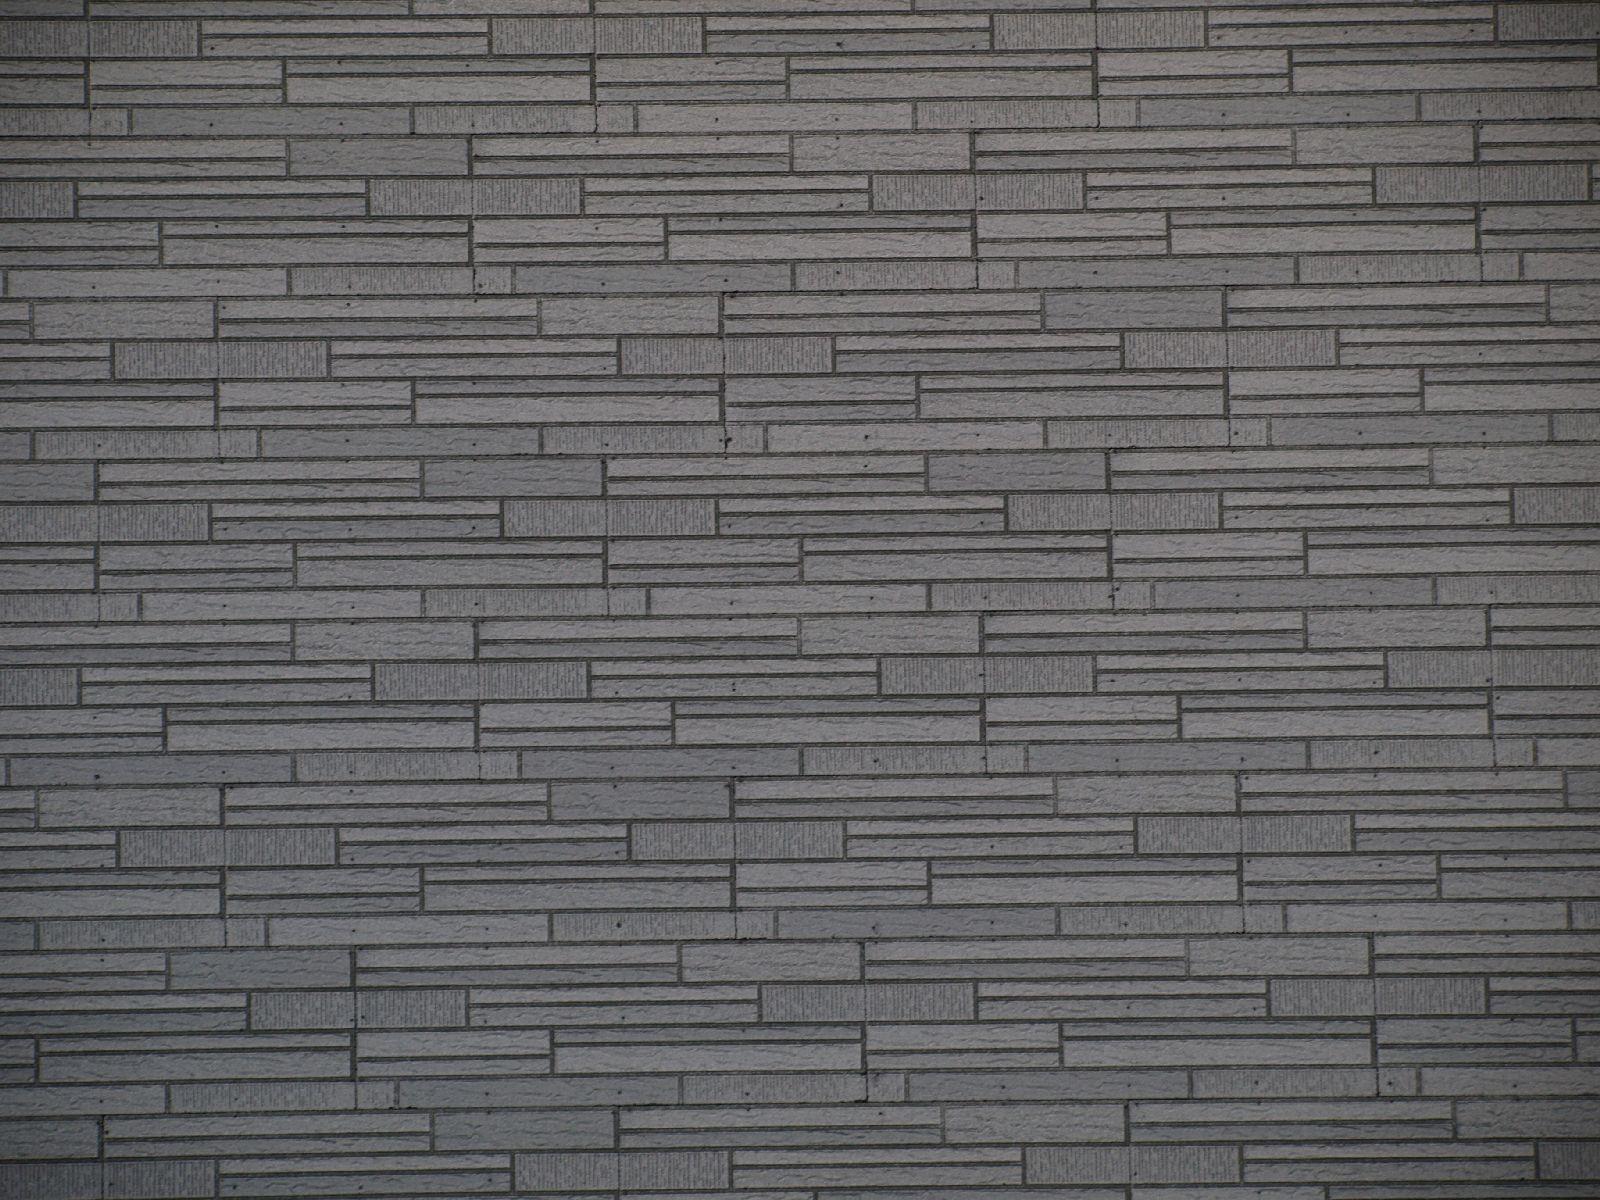 Brick_Texture_A_PA140217